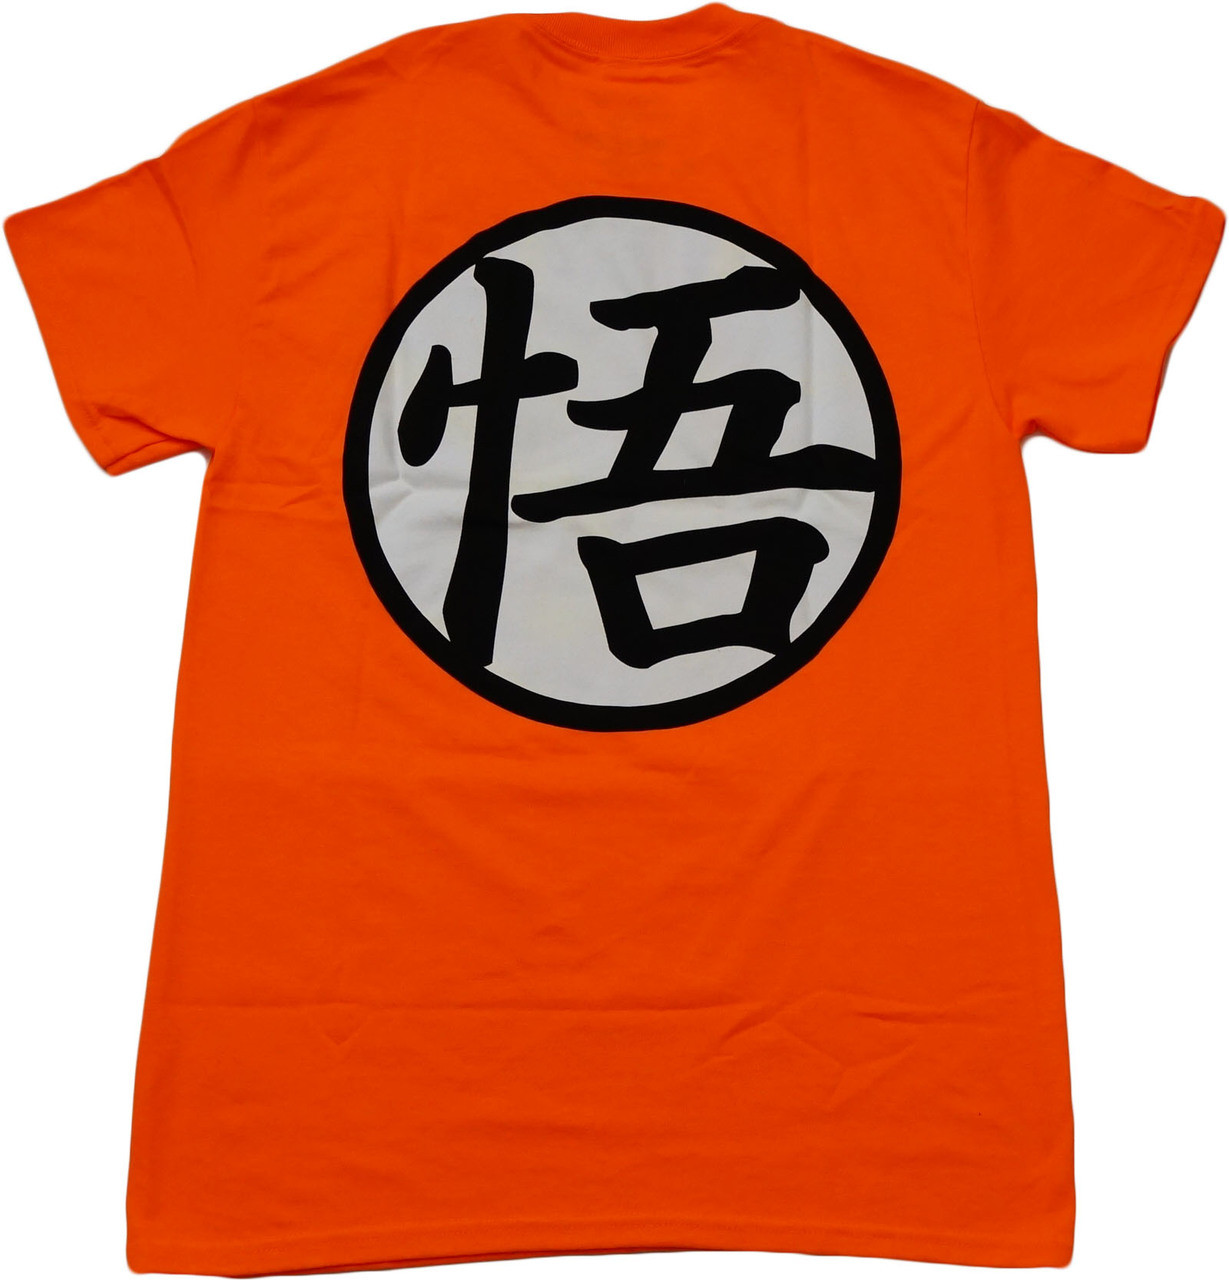 Dragon Ball Z Goku Kame Turtle King Kai Symbol Mens T Shirt